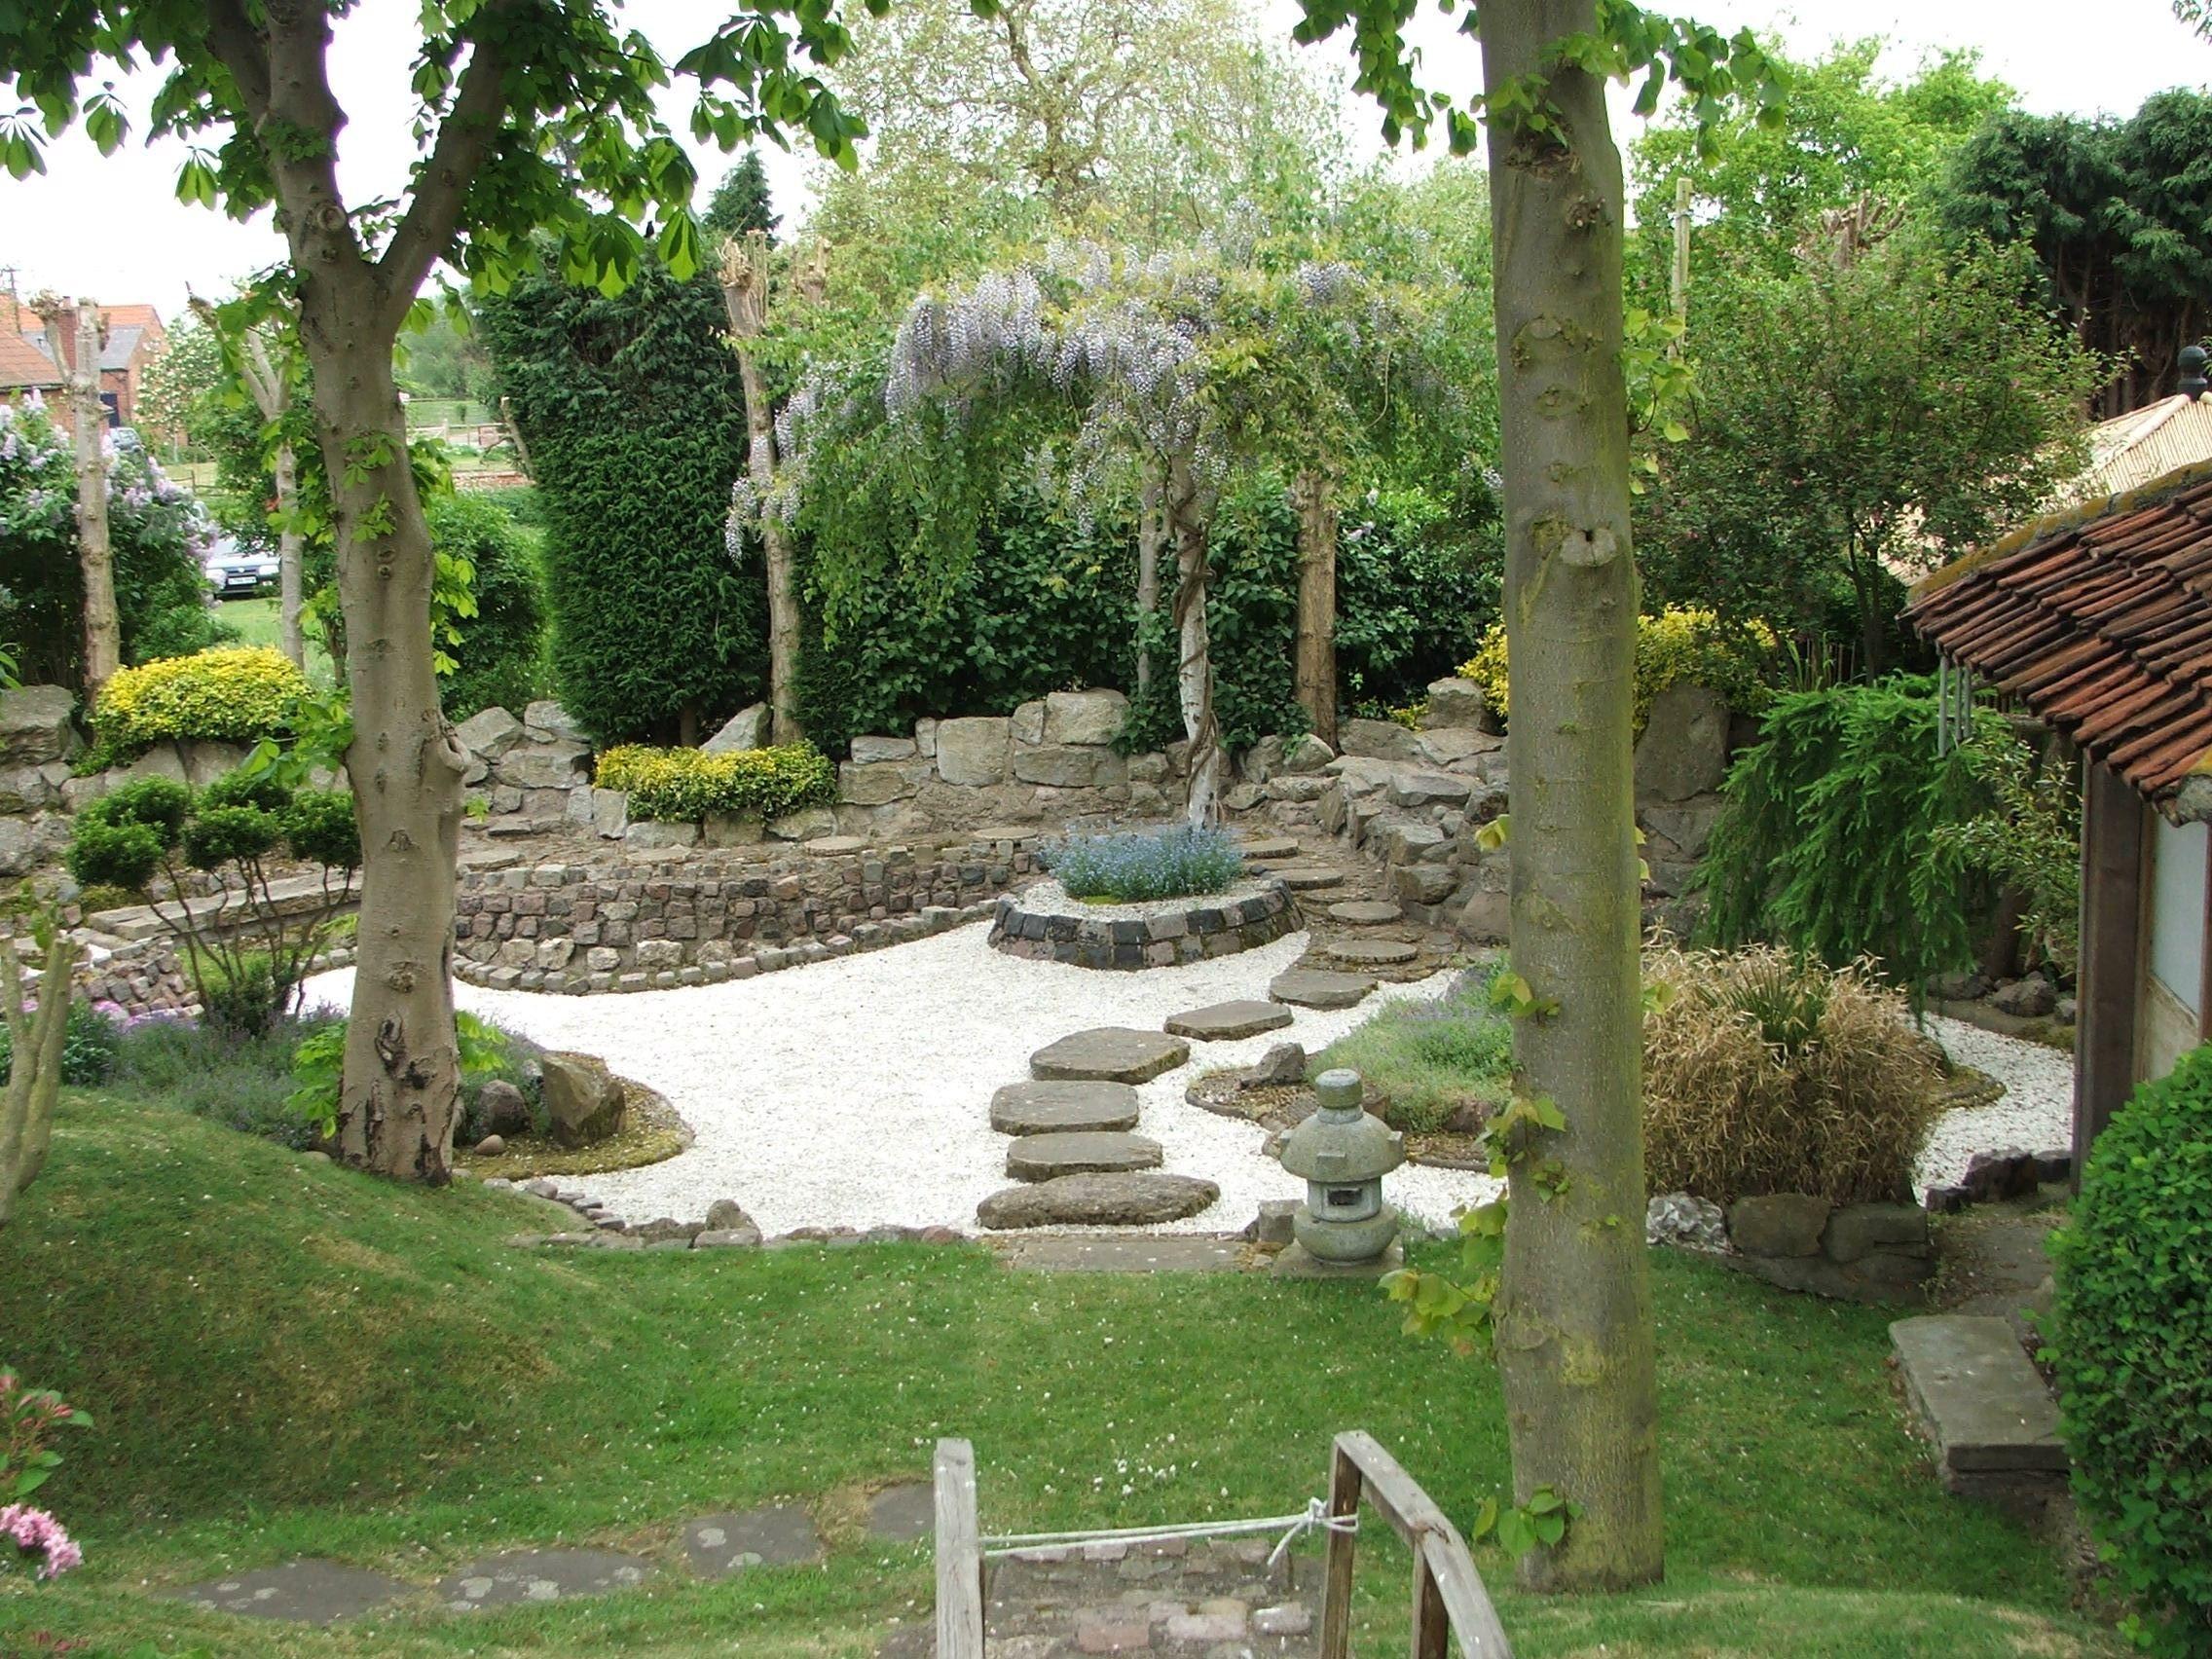 meditation garden | Gardens Asian and Contemporary | Pinterest on Meditation Patio Ideas id=20494